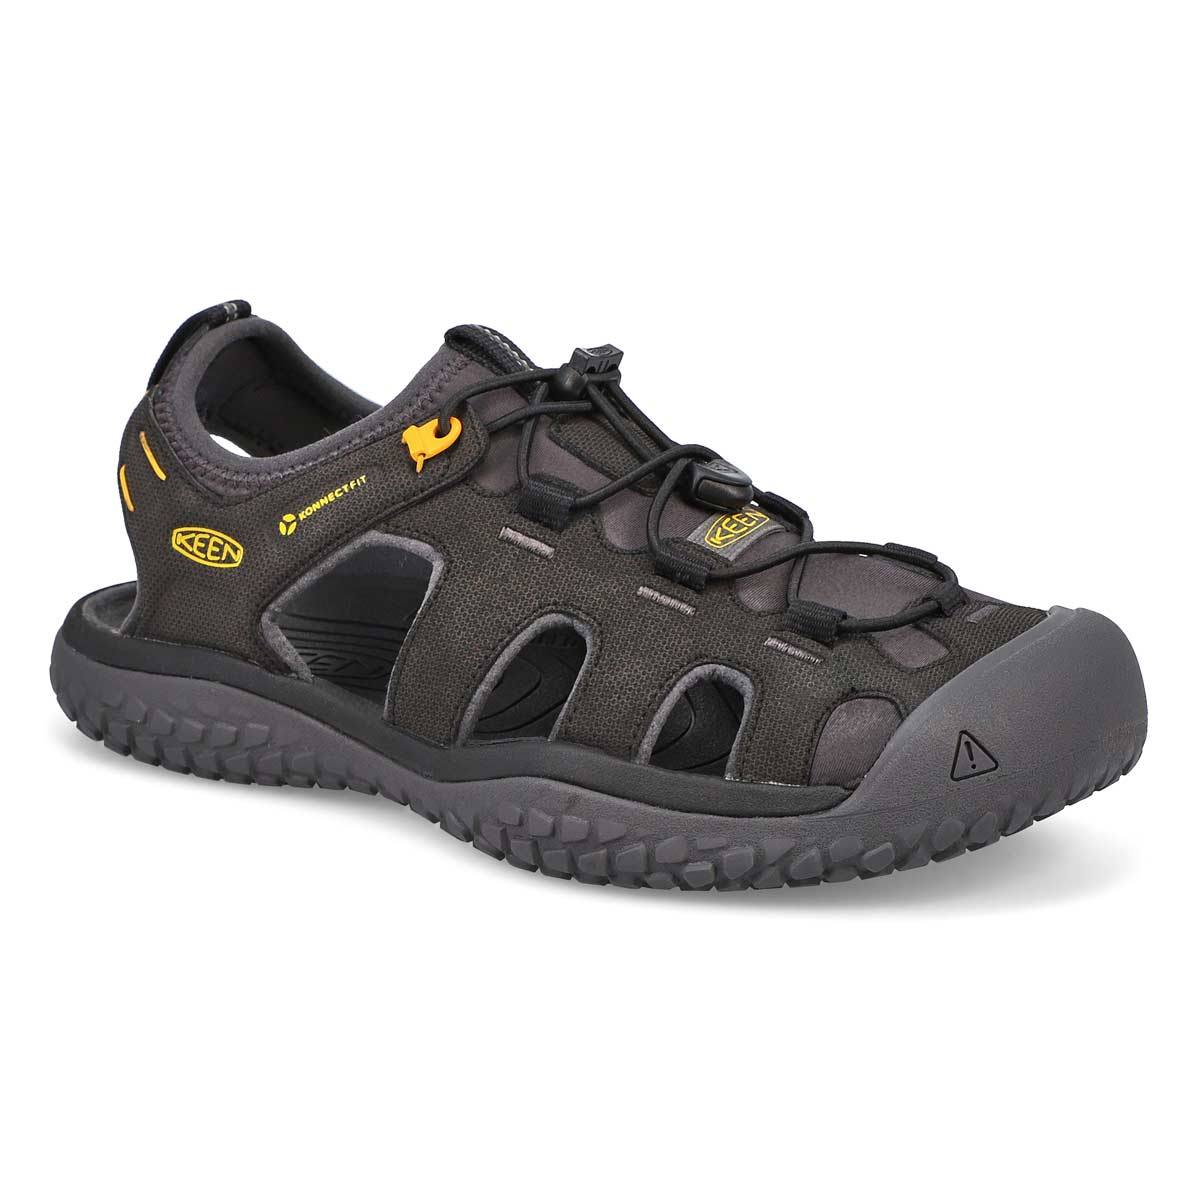 Sandale sport Solr noir/or,hommes